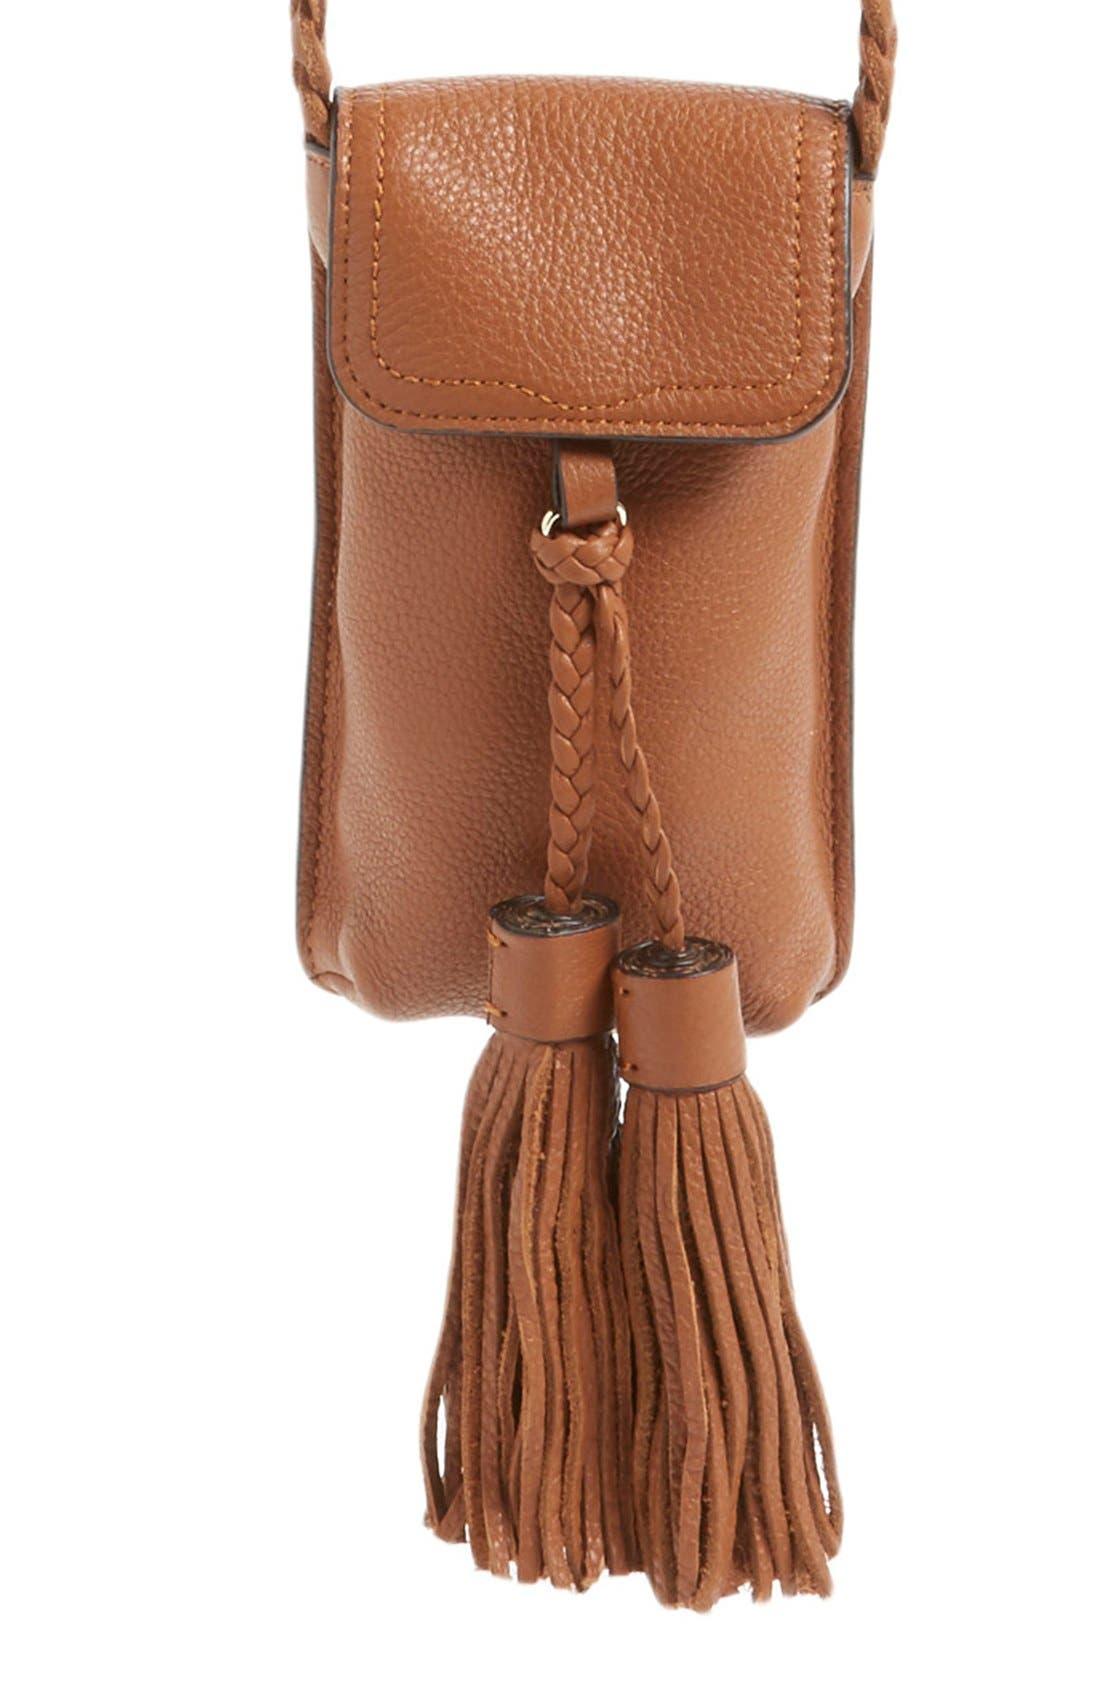 Main Image - Rebecca Minkoff Isobel Phone Crossbody Bag